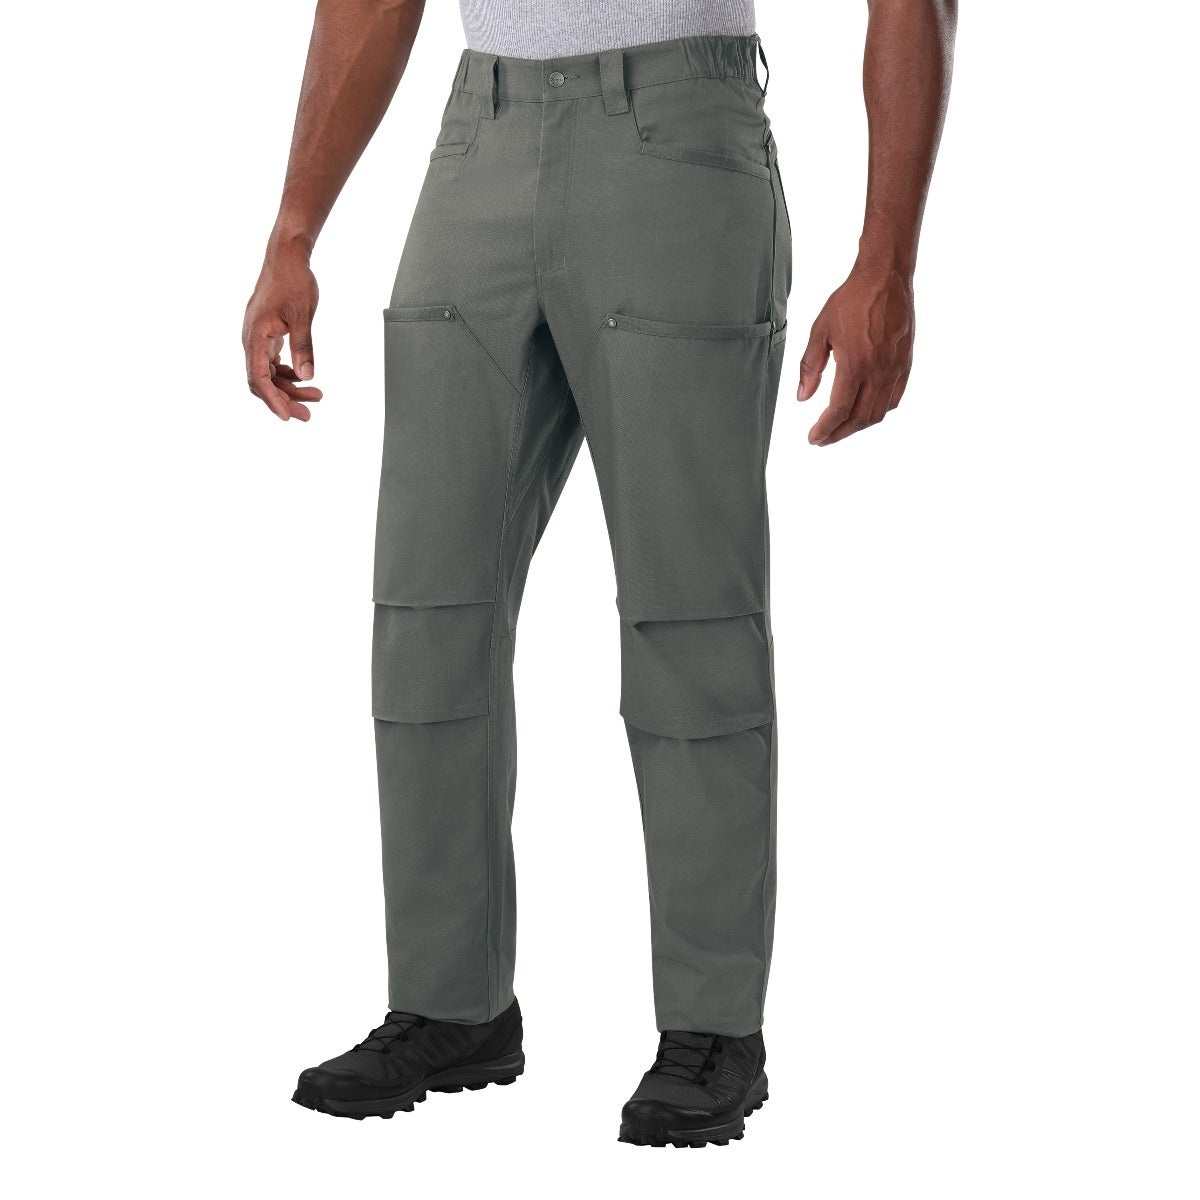 Vertx Vertx Travail 2.0 Pants